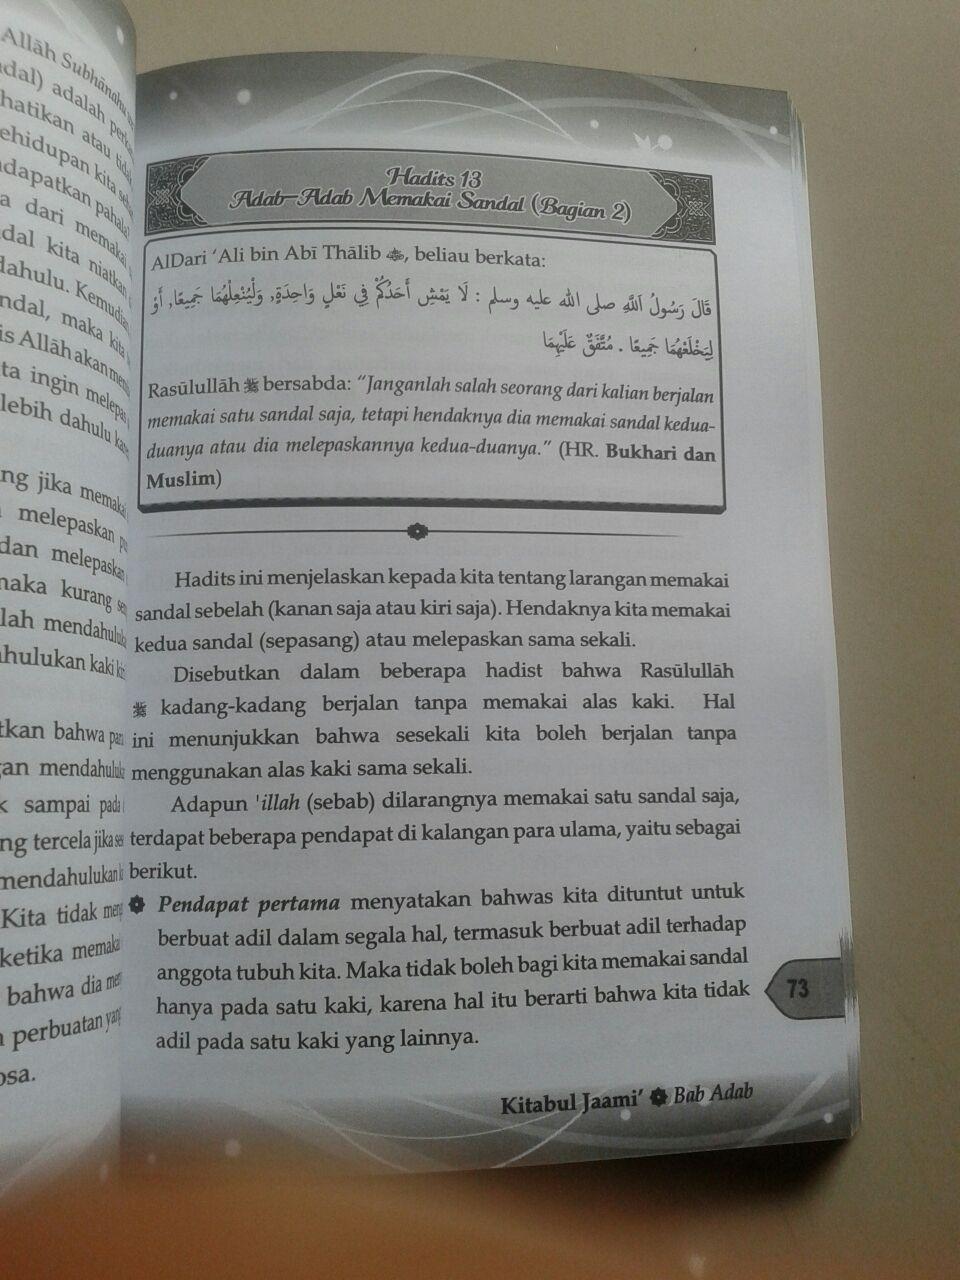 Buku Muslim Yang Sempurna Imannya Yang Paling Baik Akhlaknya isi 3